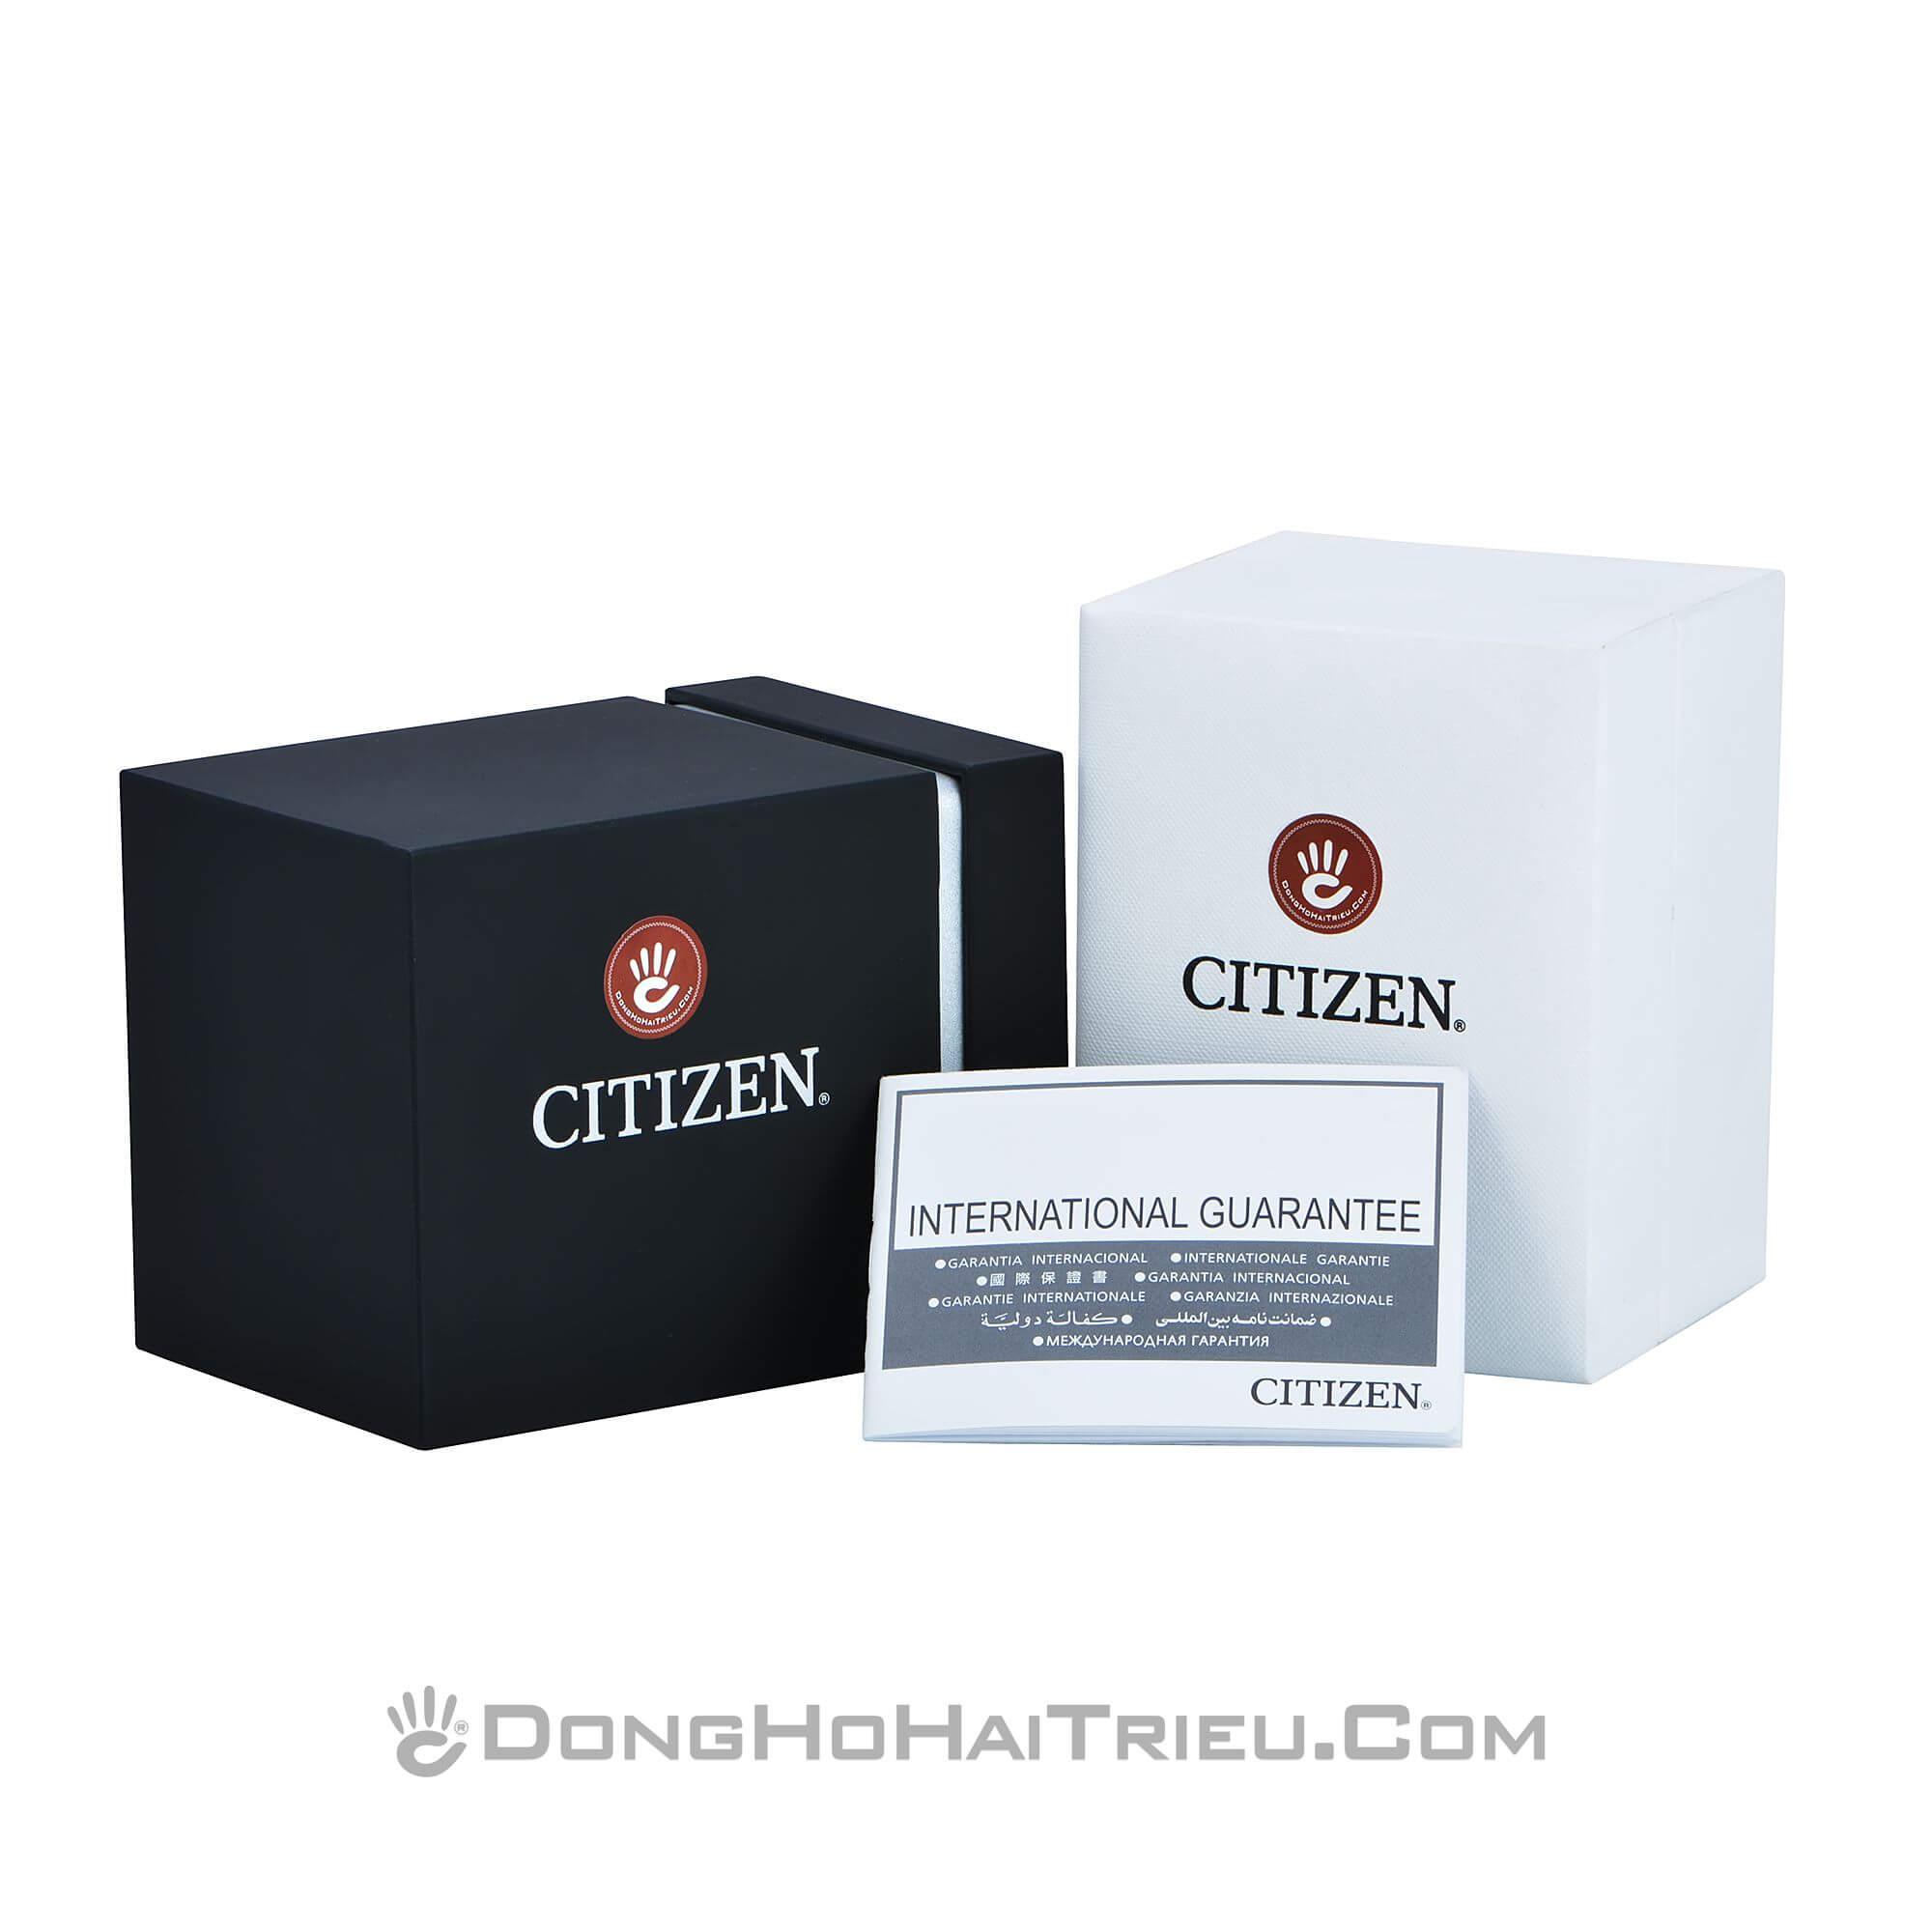 Citizen-Box1